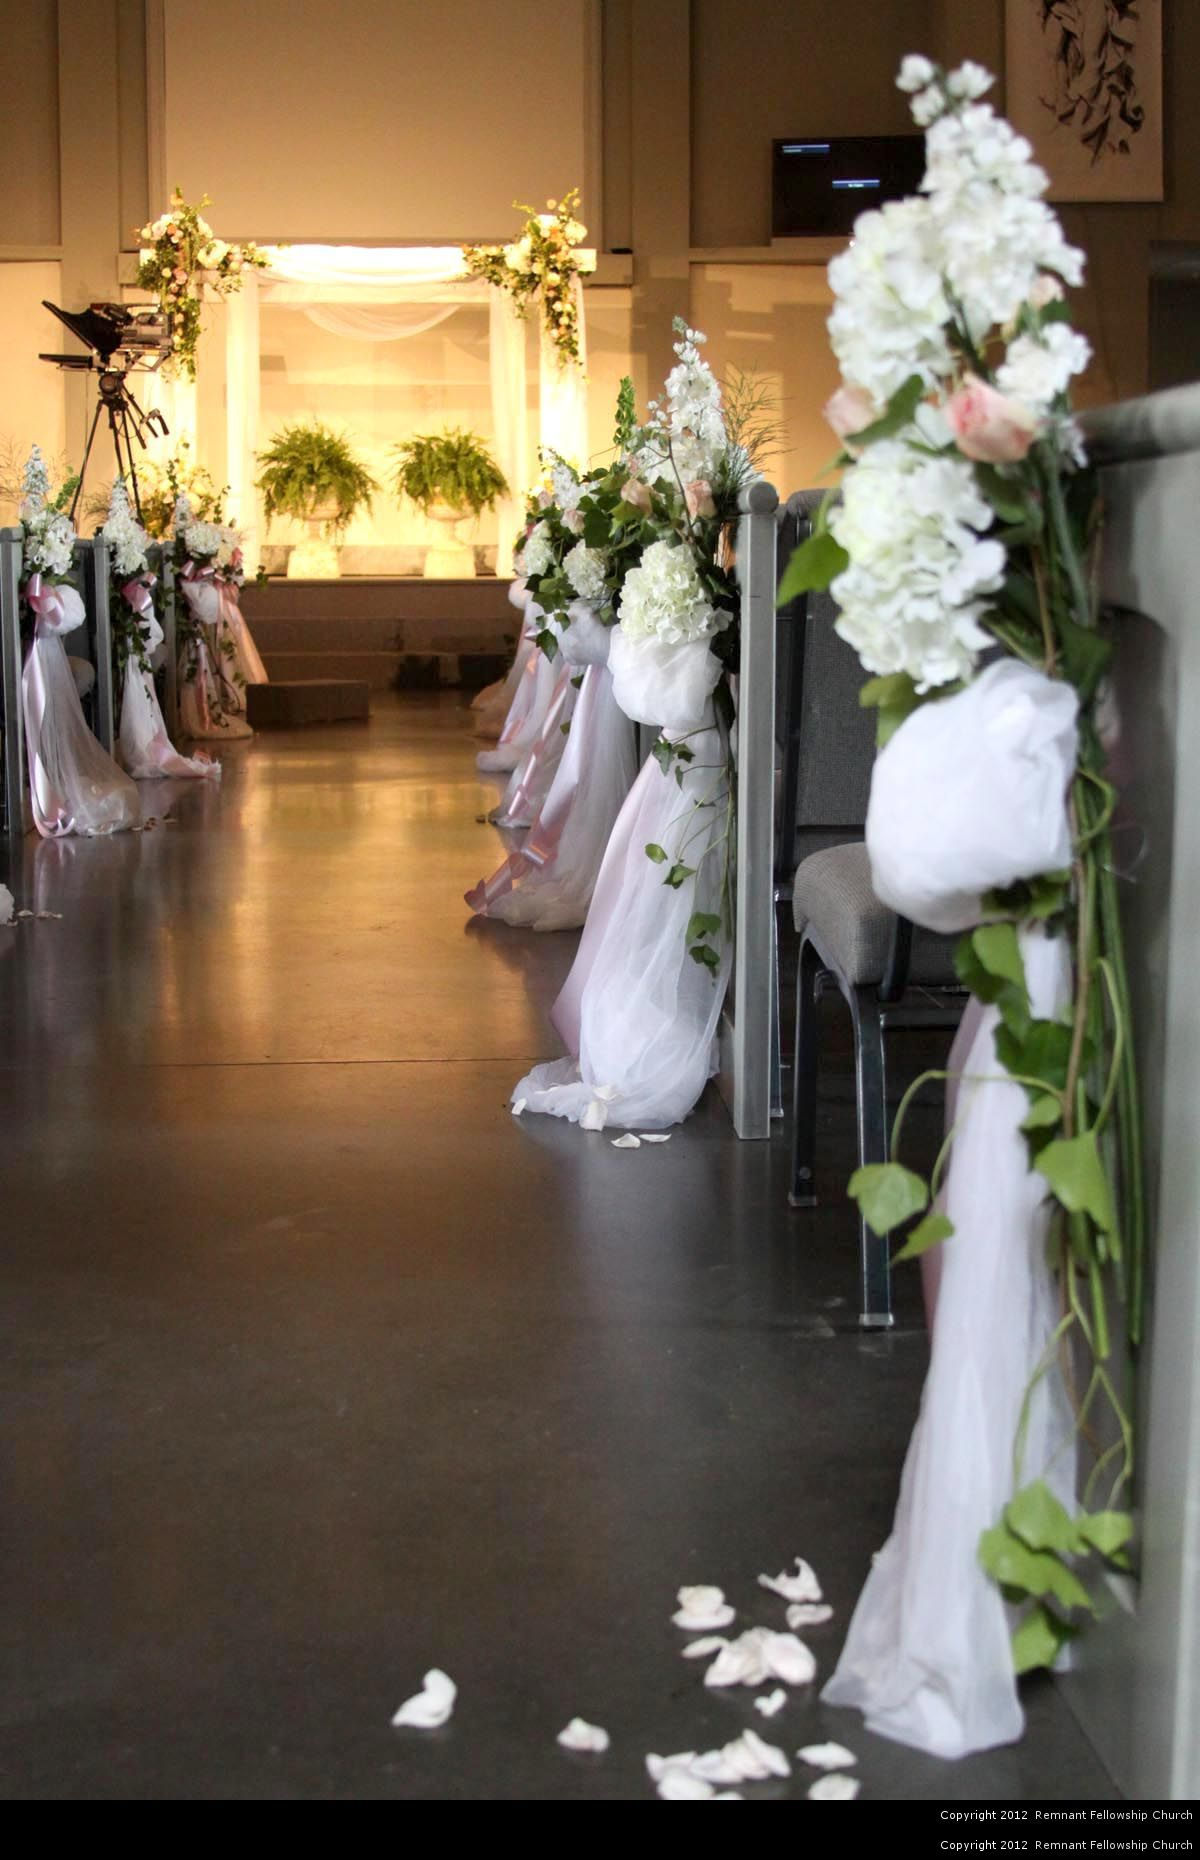 Remnant-Fellowship-Wedding-Spring-Kyle-Davis_7953